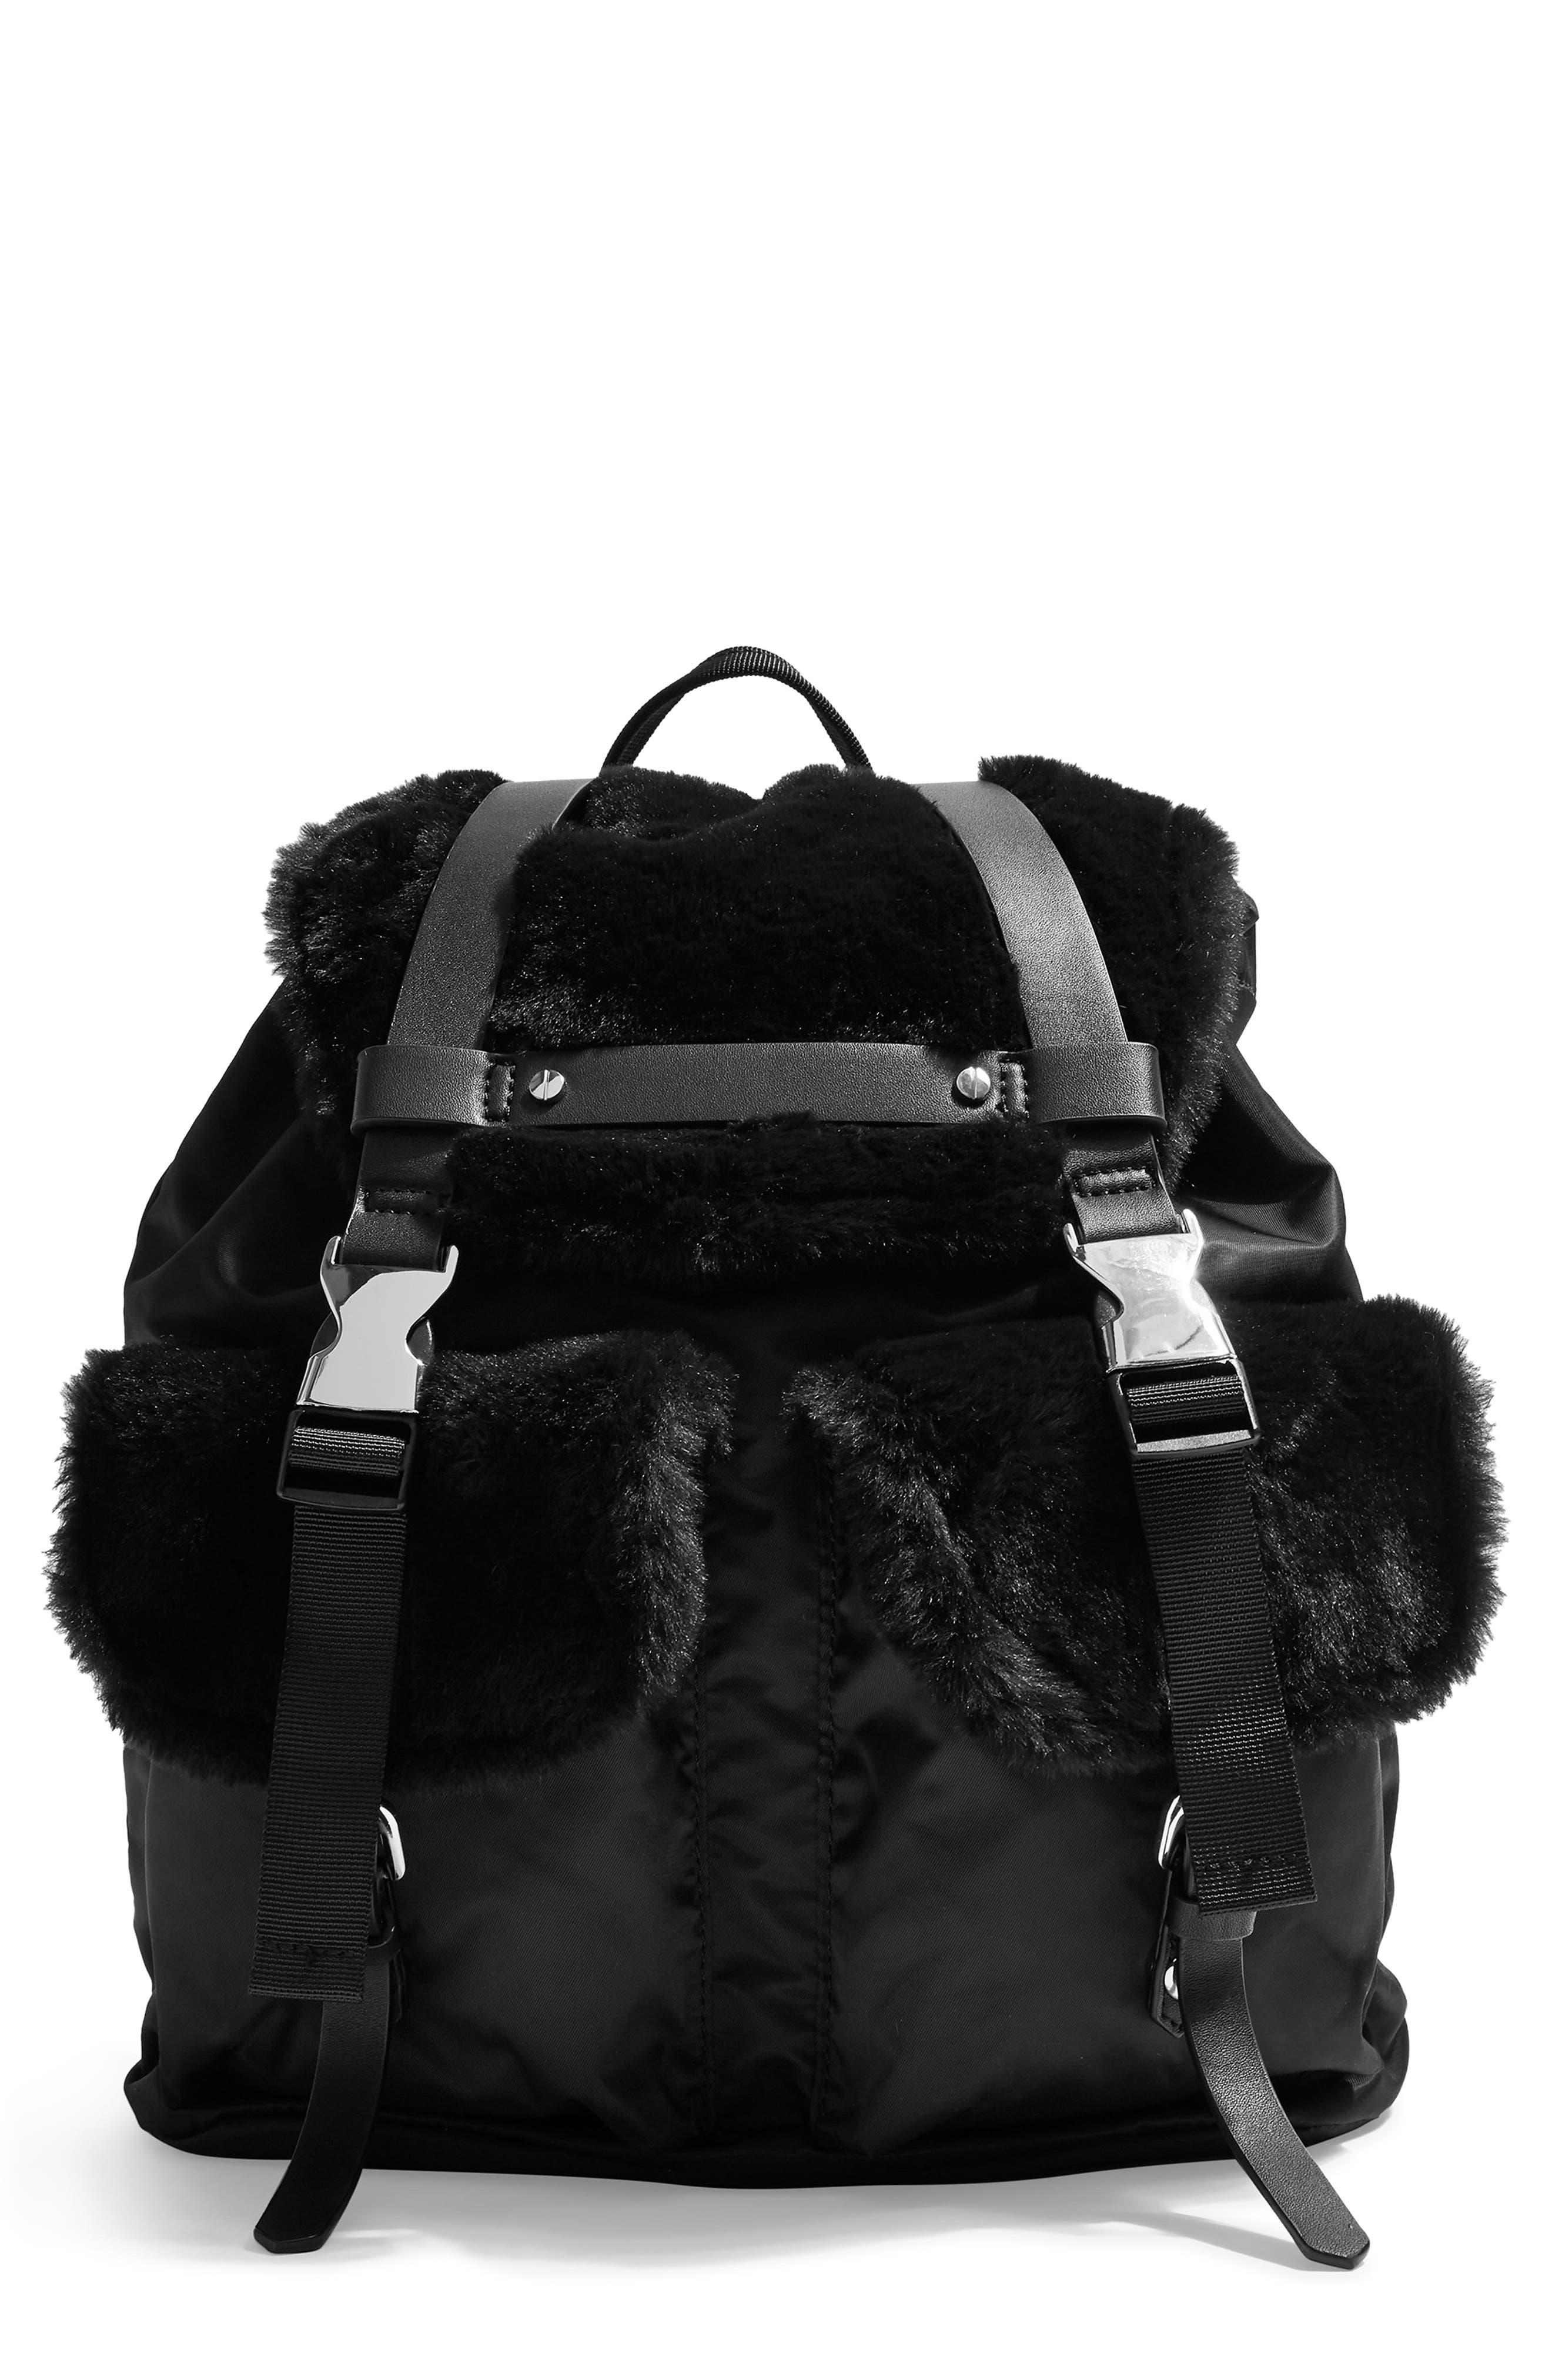 Topshop Boston Faux Fur Backpack - Black